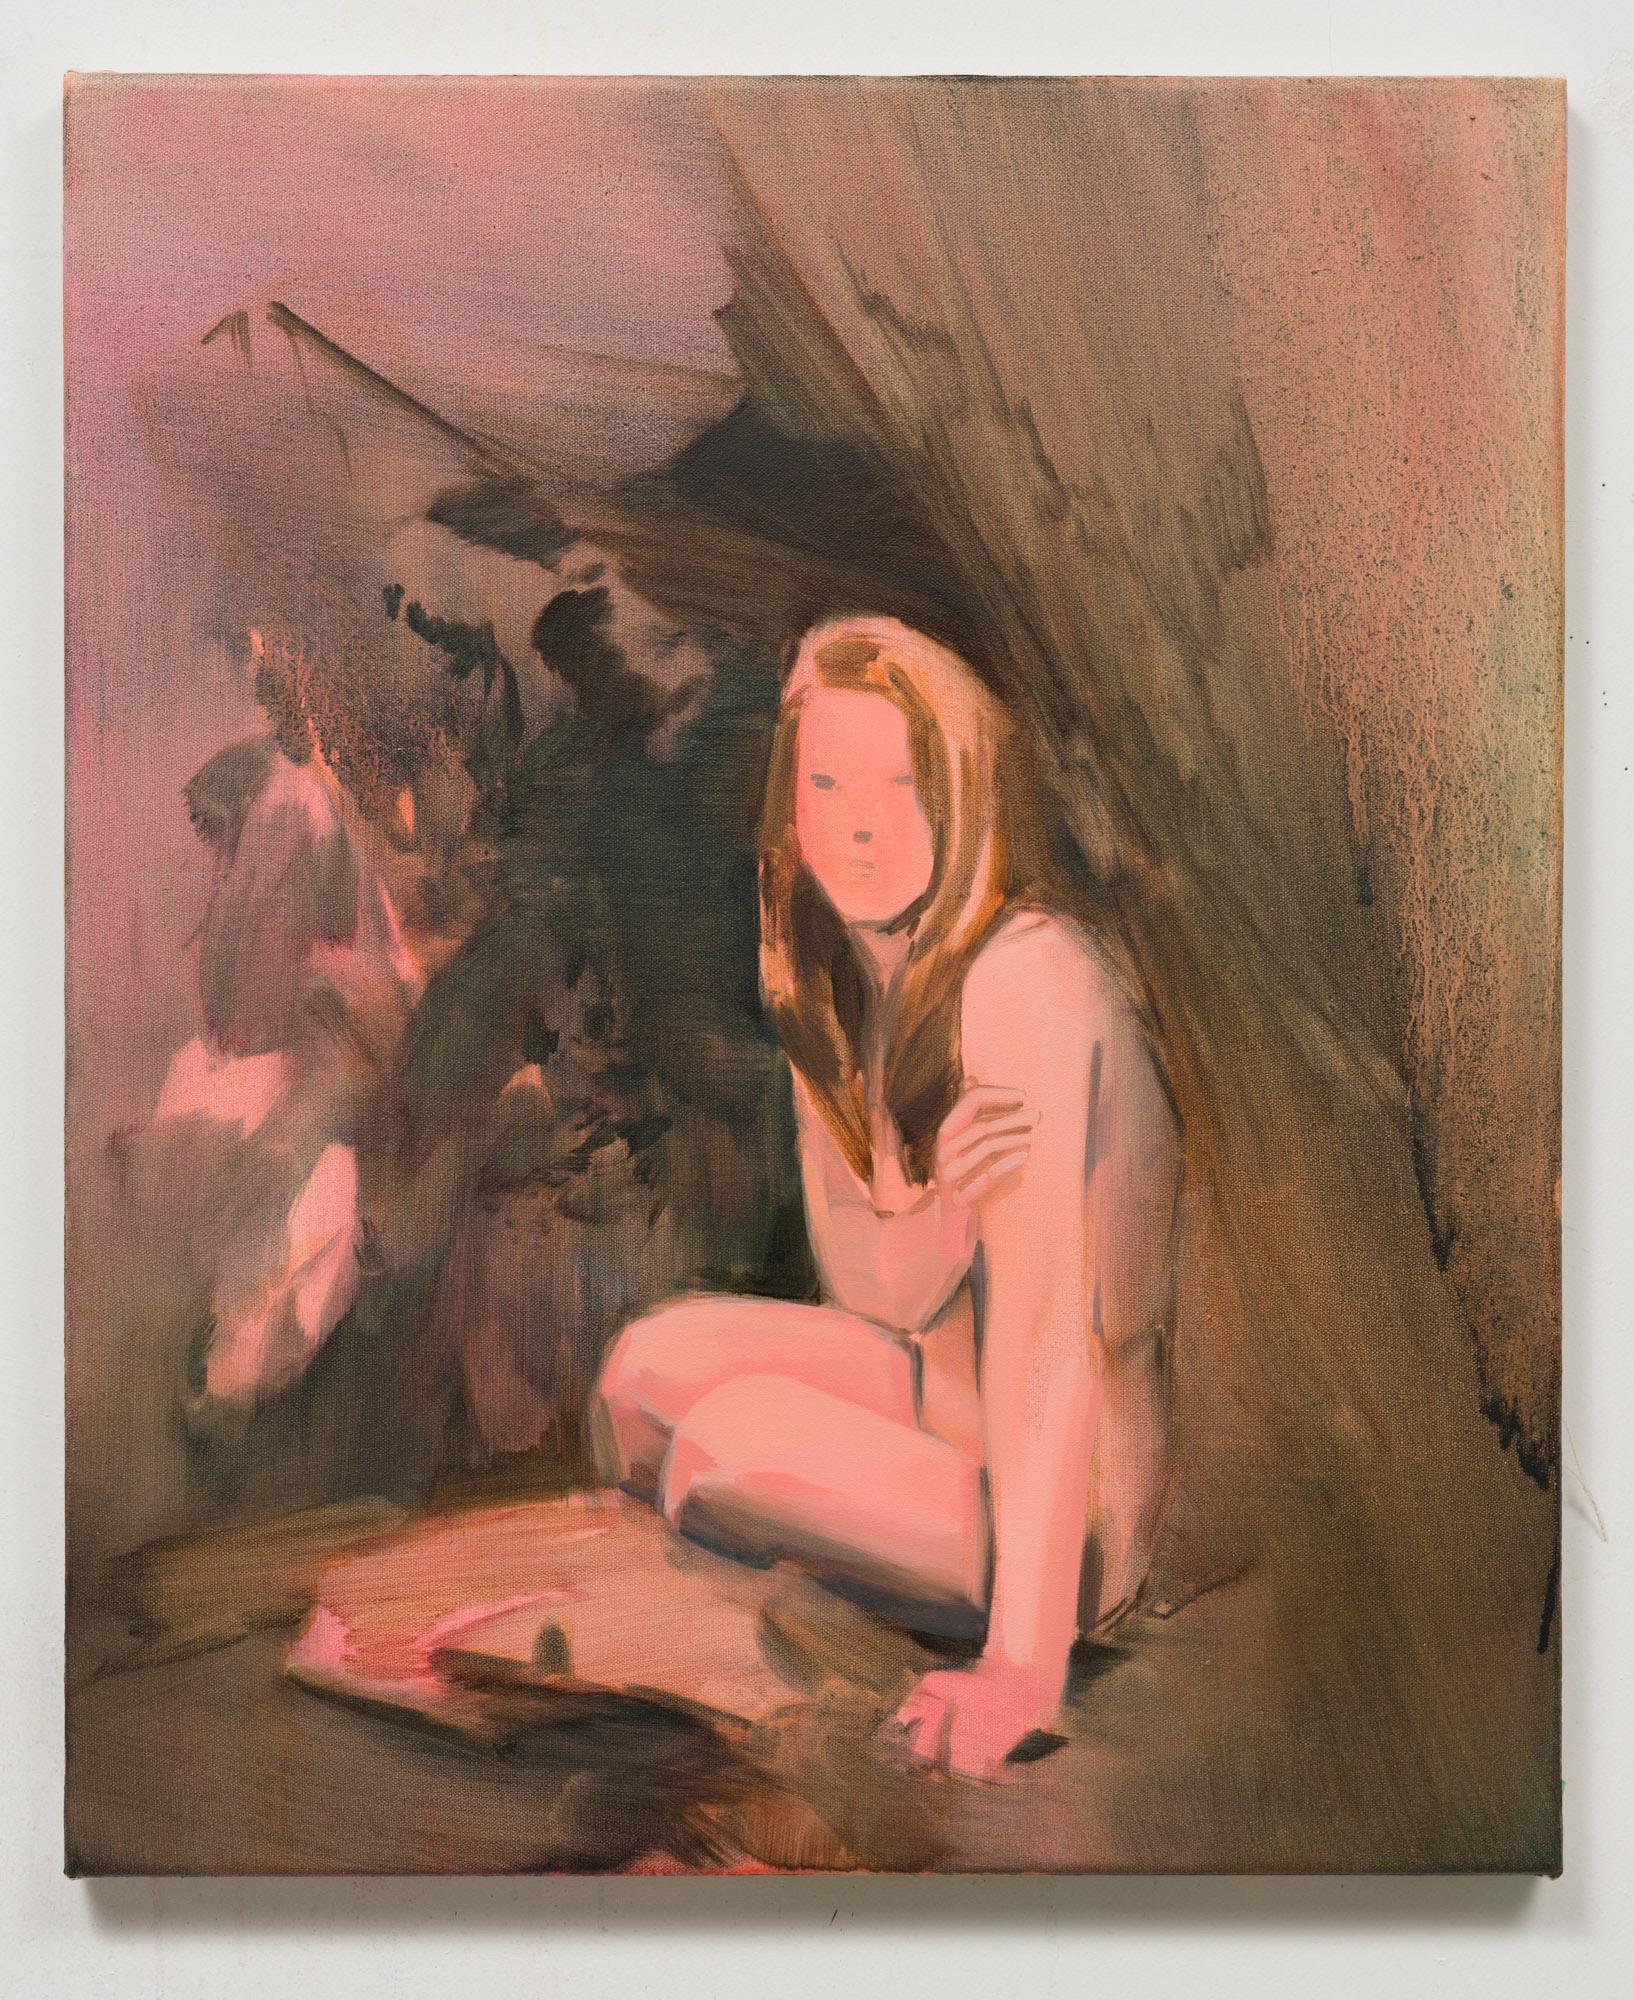 Corri-Lynn Tetz, Shelter , 2017, oil on canvas, 20 x 24 inches